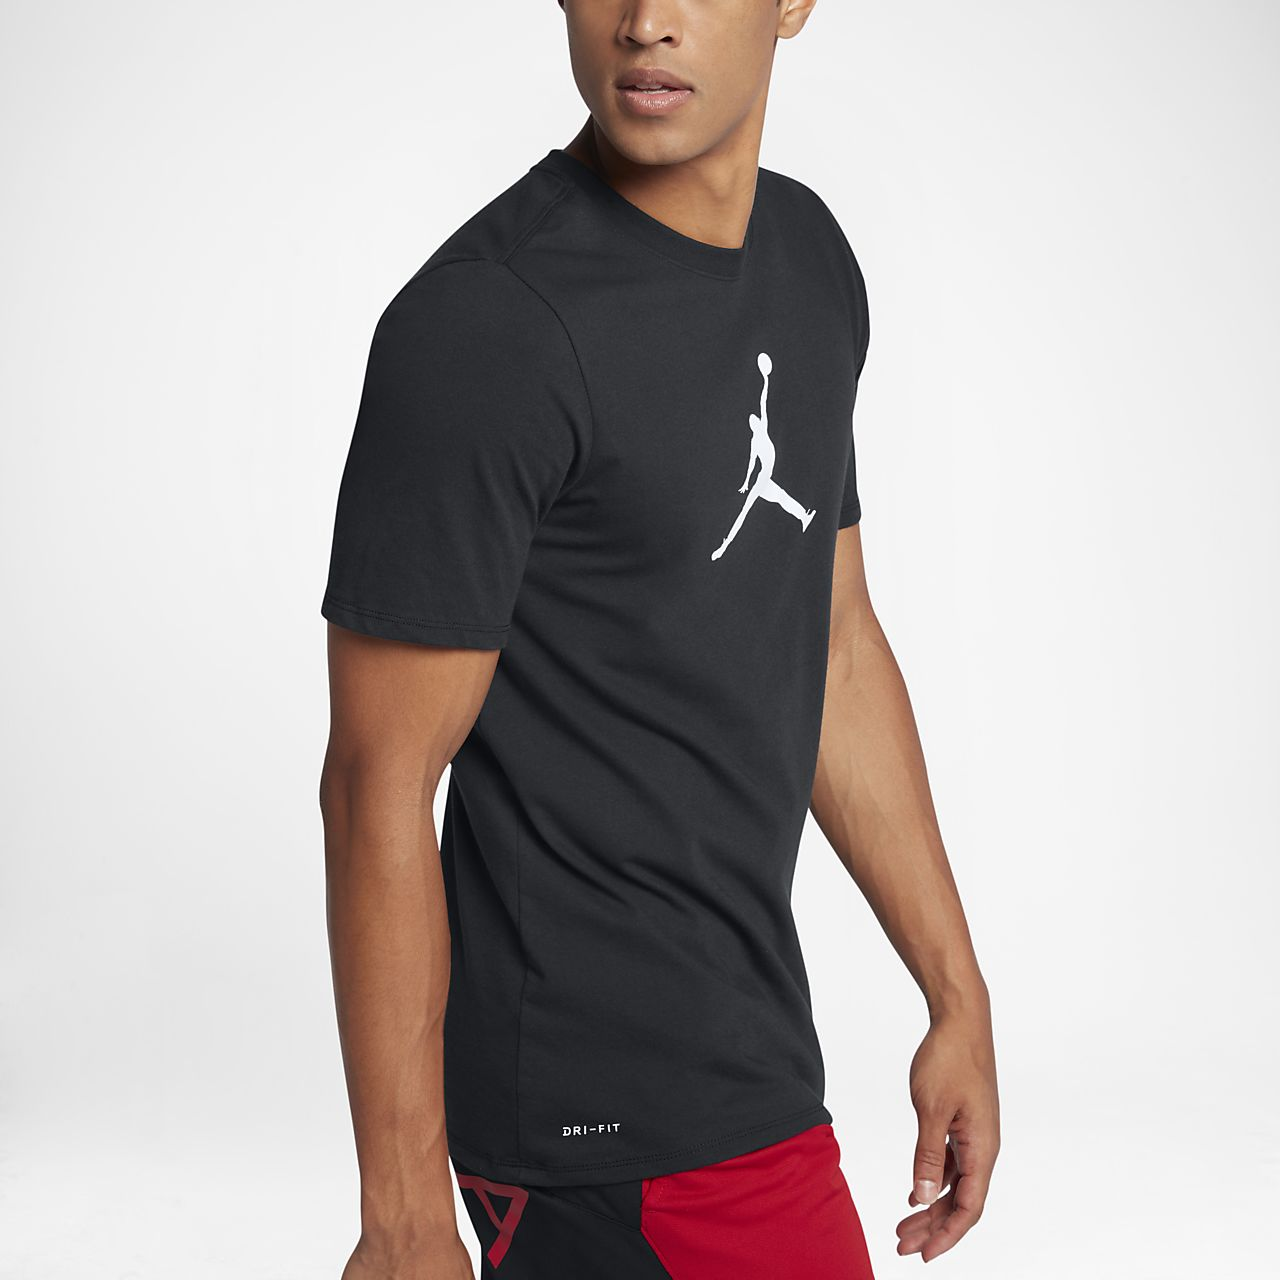 bfd6bc52268099 Мужская футболка Jordan JMTC Tee 23 7 Jumpman Black White - фото 4